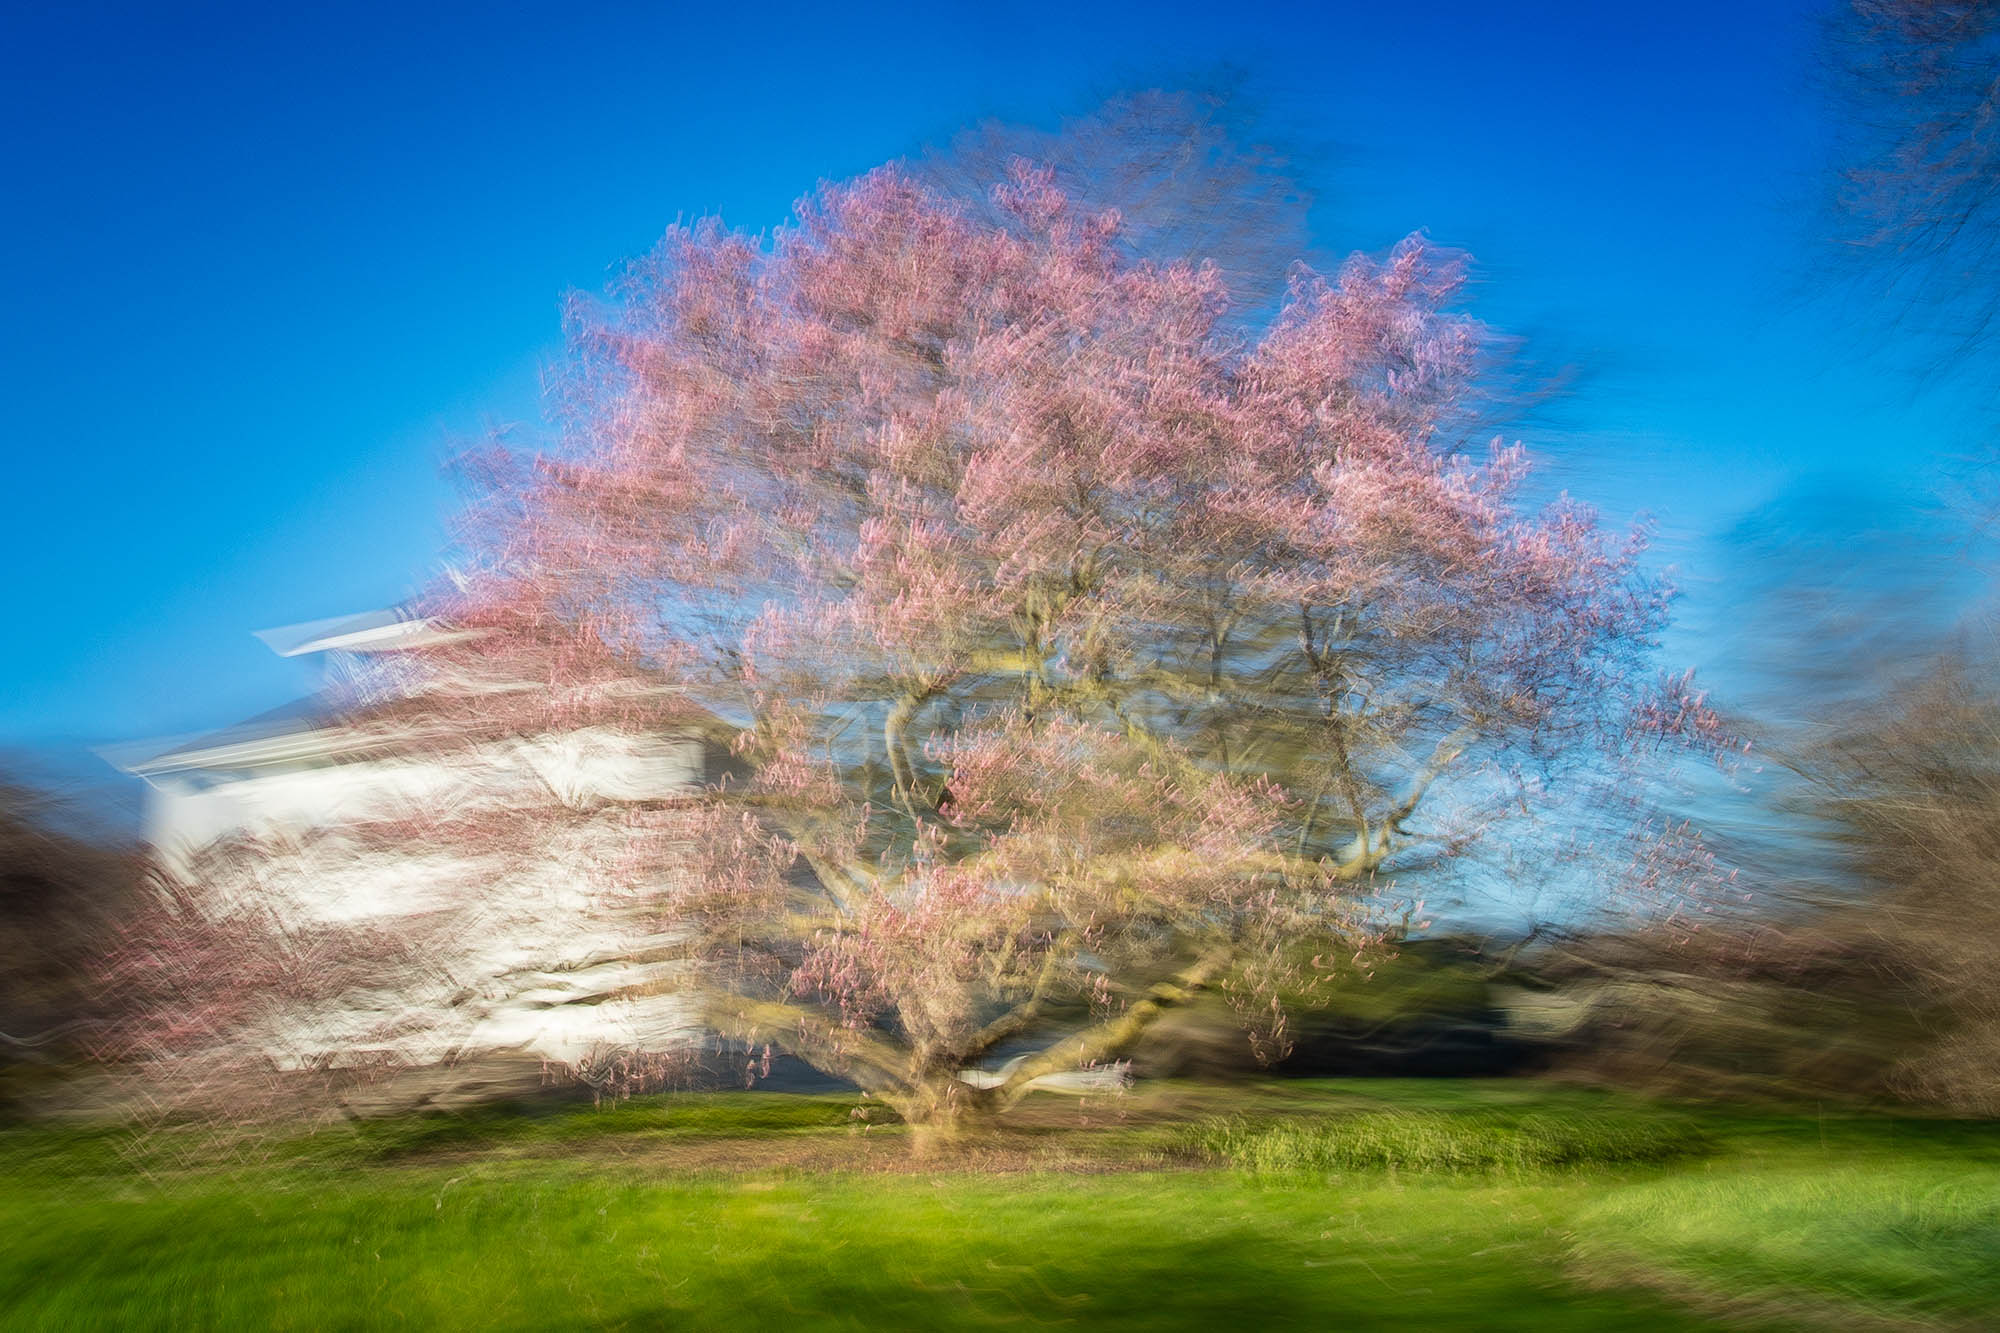 Giant Magnolia  - Queenston - 04-2016-_61A1136.jpg